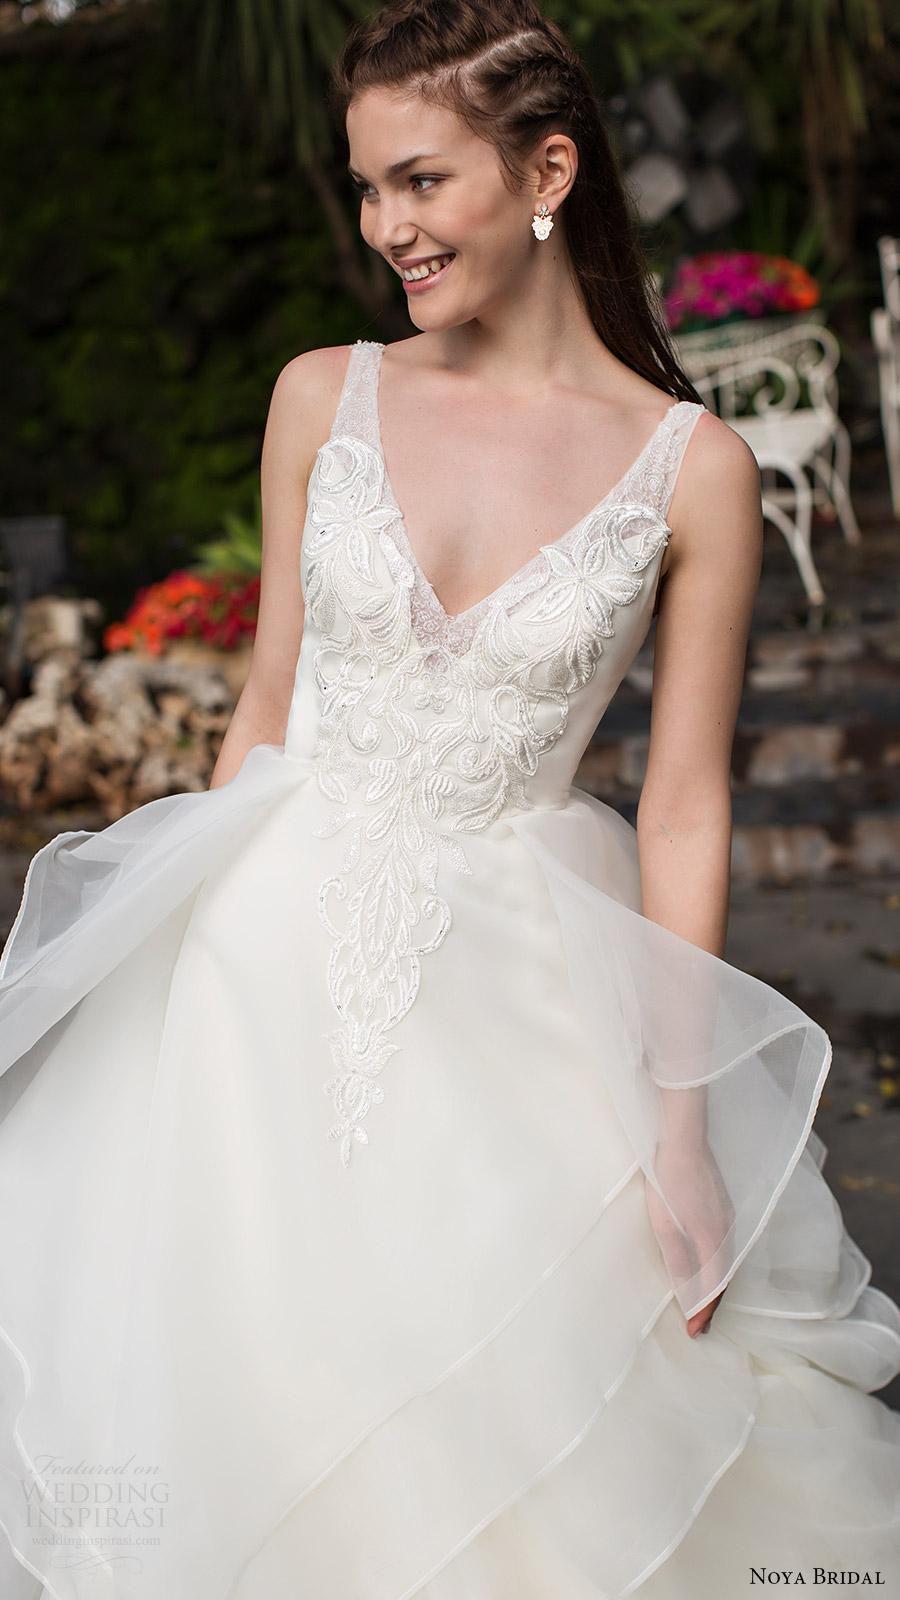 noya bridal 2016 sleeveless straps vneck aline ball gown wedding dress (1209) romantic princess zv